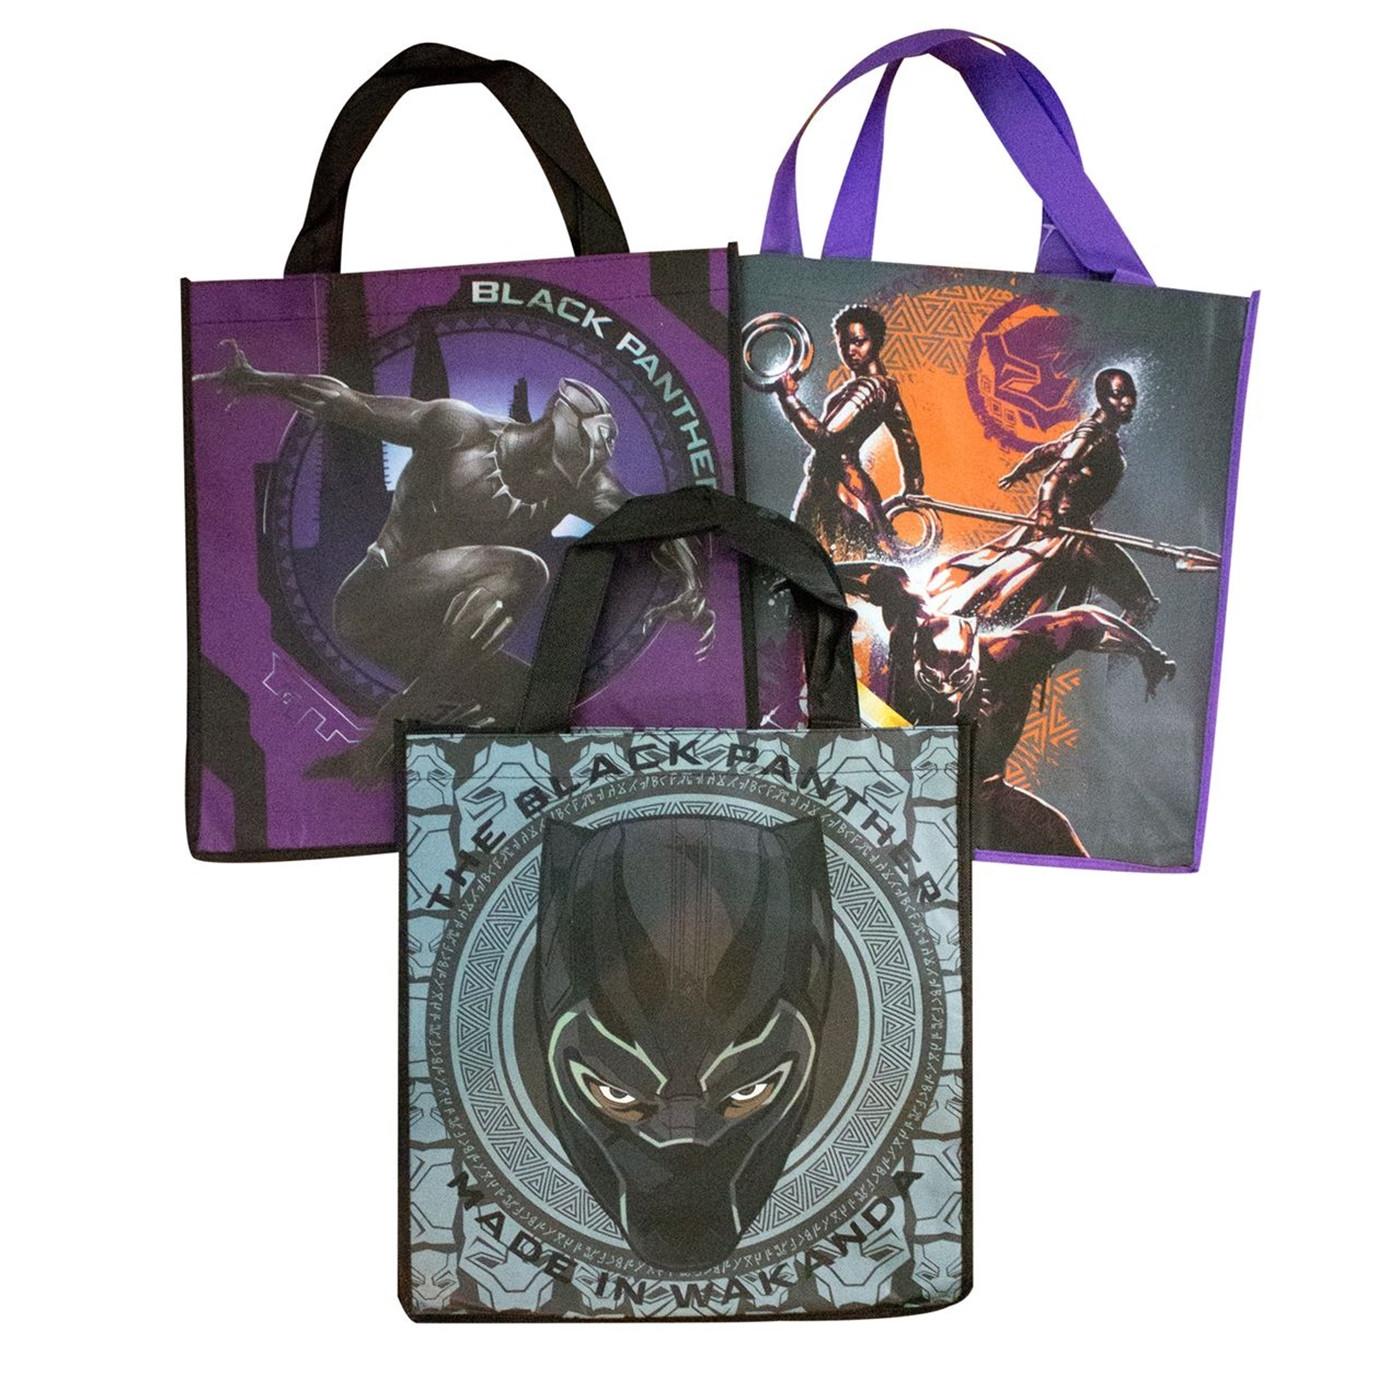 Black Panther Tote Bag 1 of 3